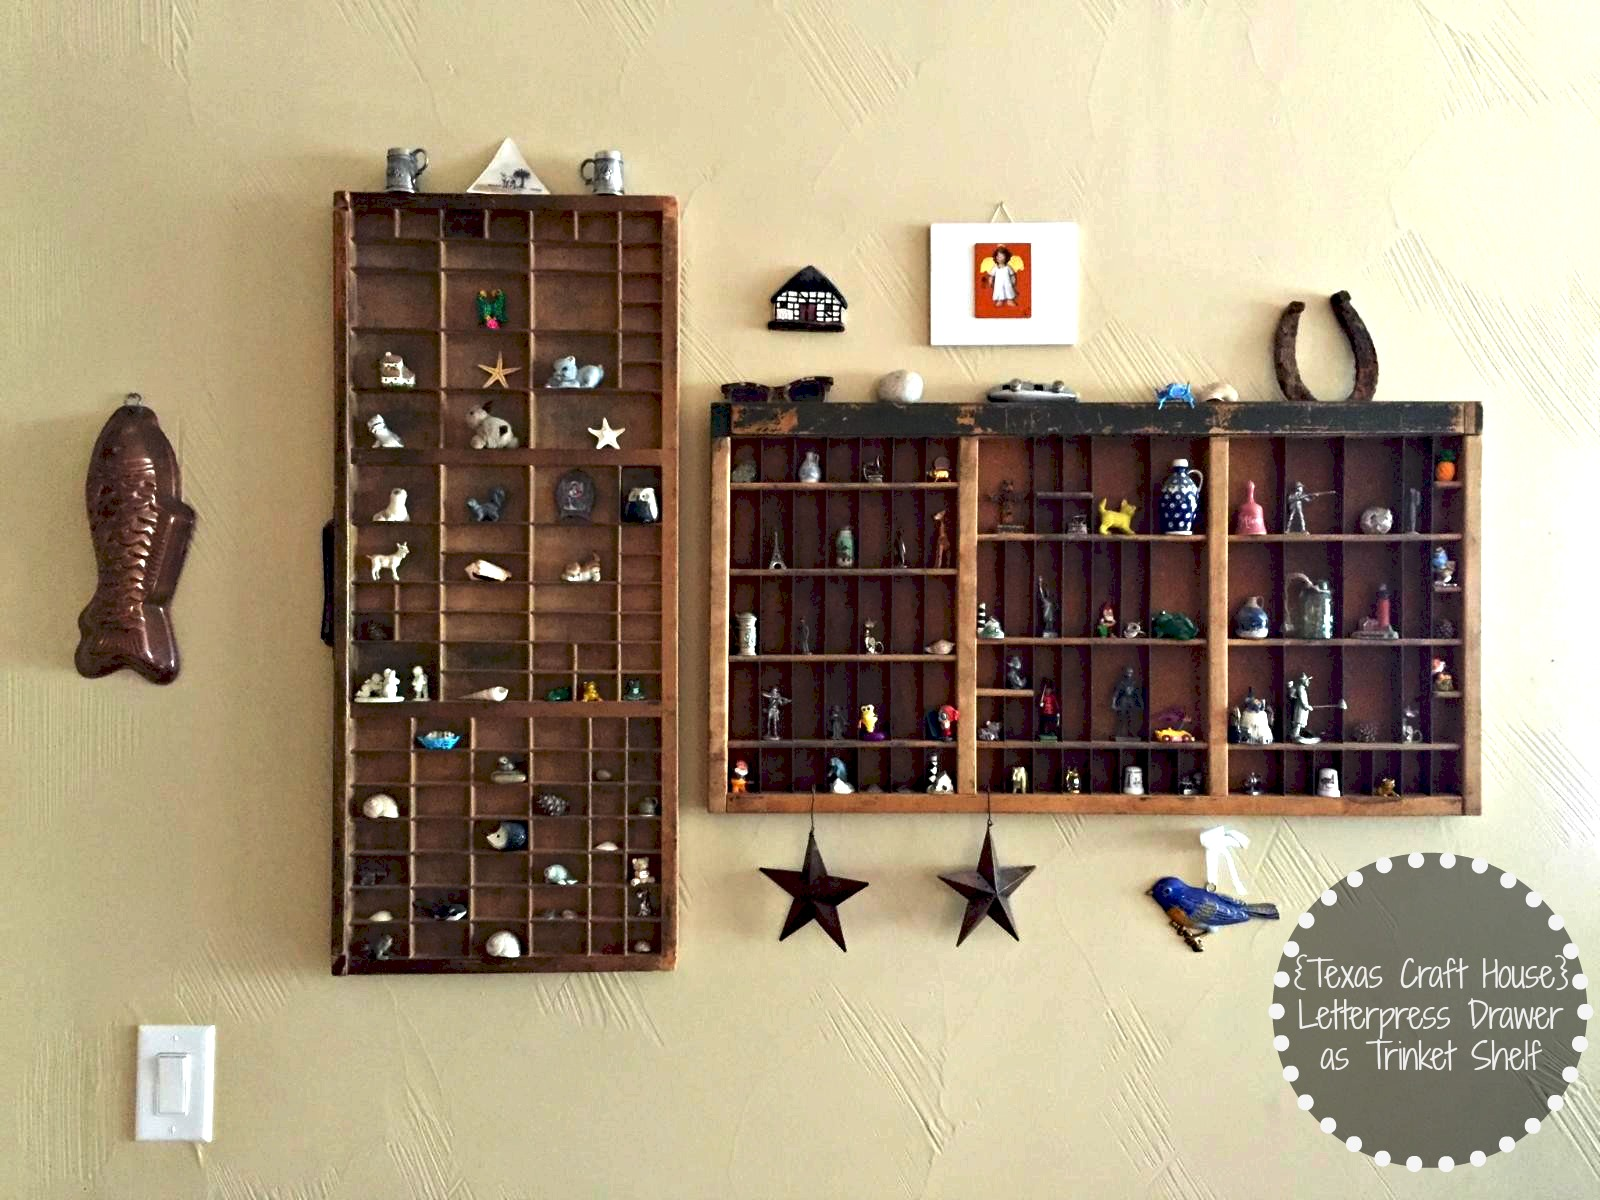 Letterpress Drawer as Trinket Shelf | Texas Craft House